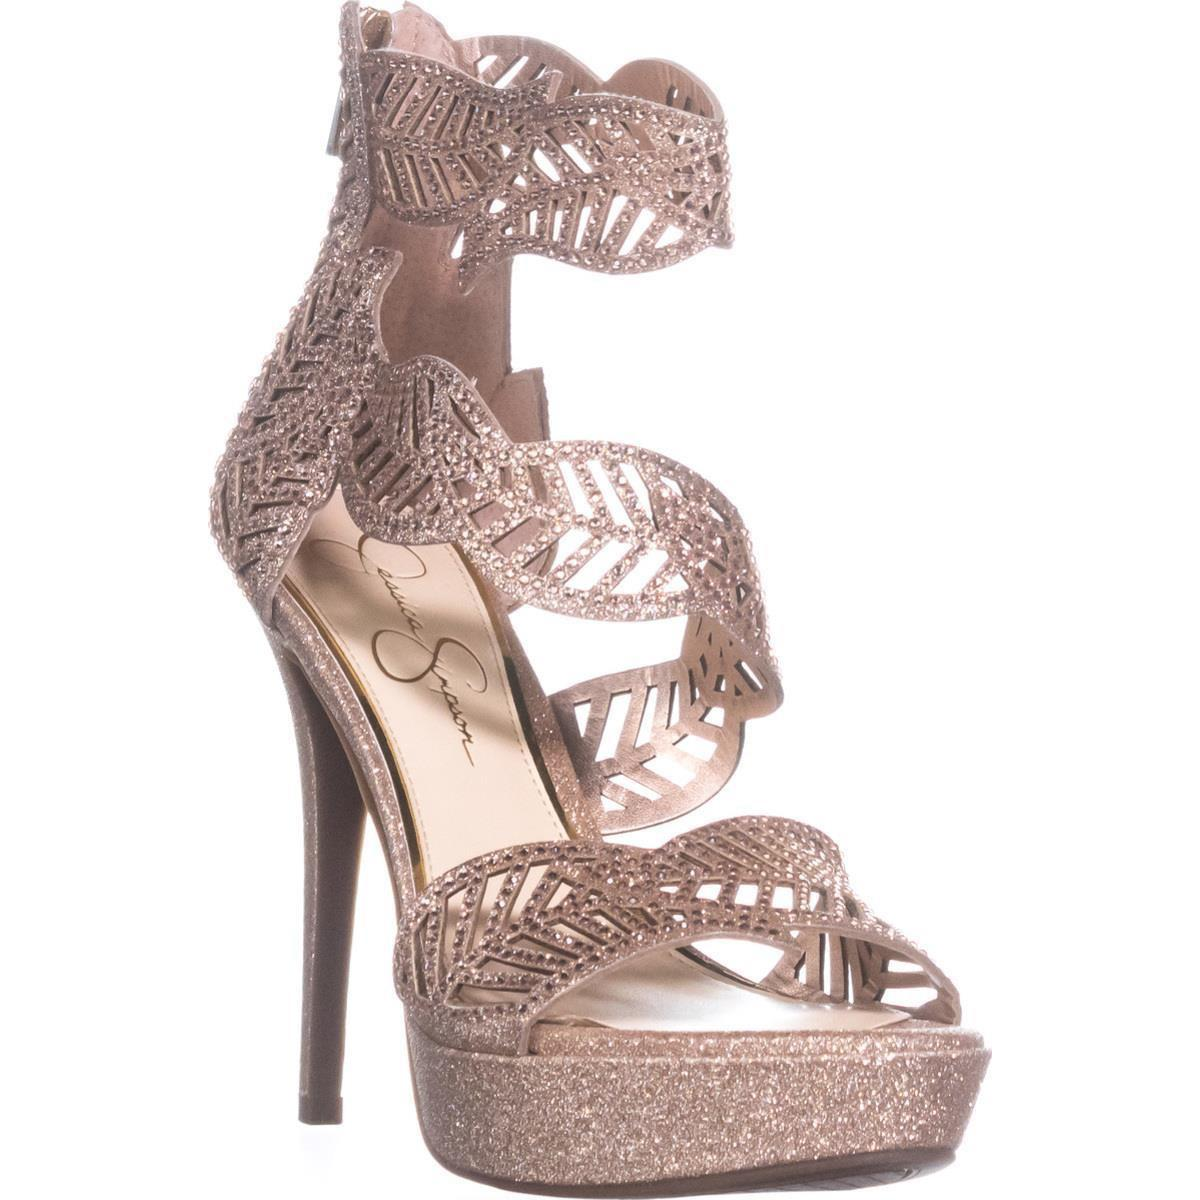 a3cdfca24340 Lyst - Jessica Simpson Bonilynn Platform Heeled Sandals in Pink